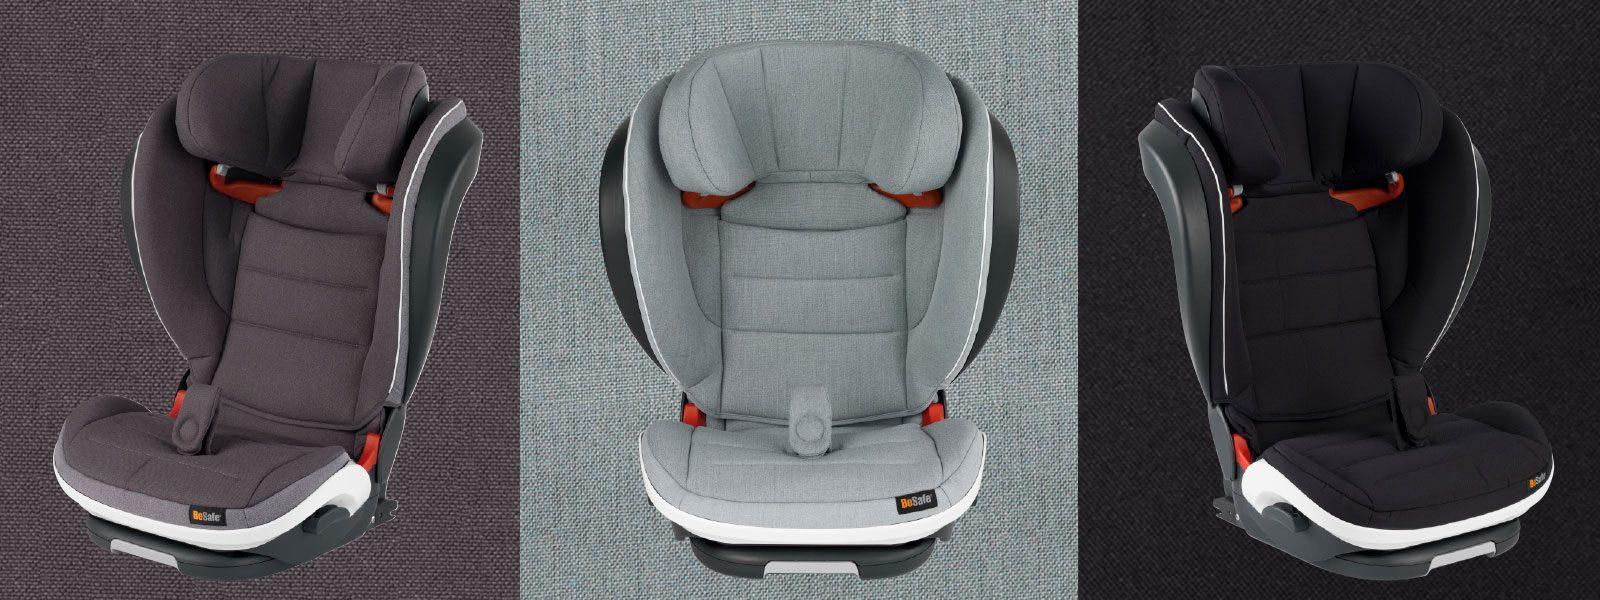 besafe flex fix new booster seat